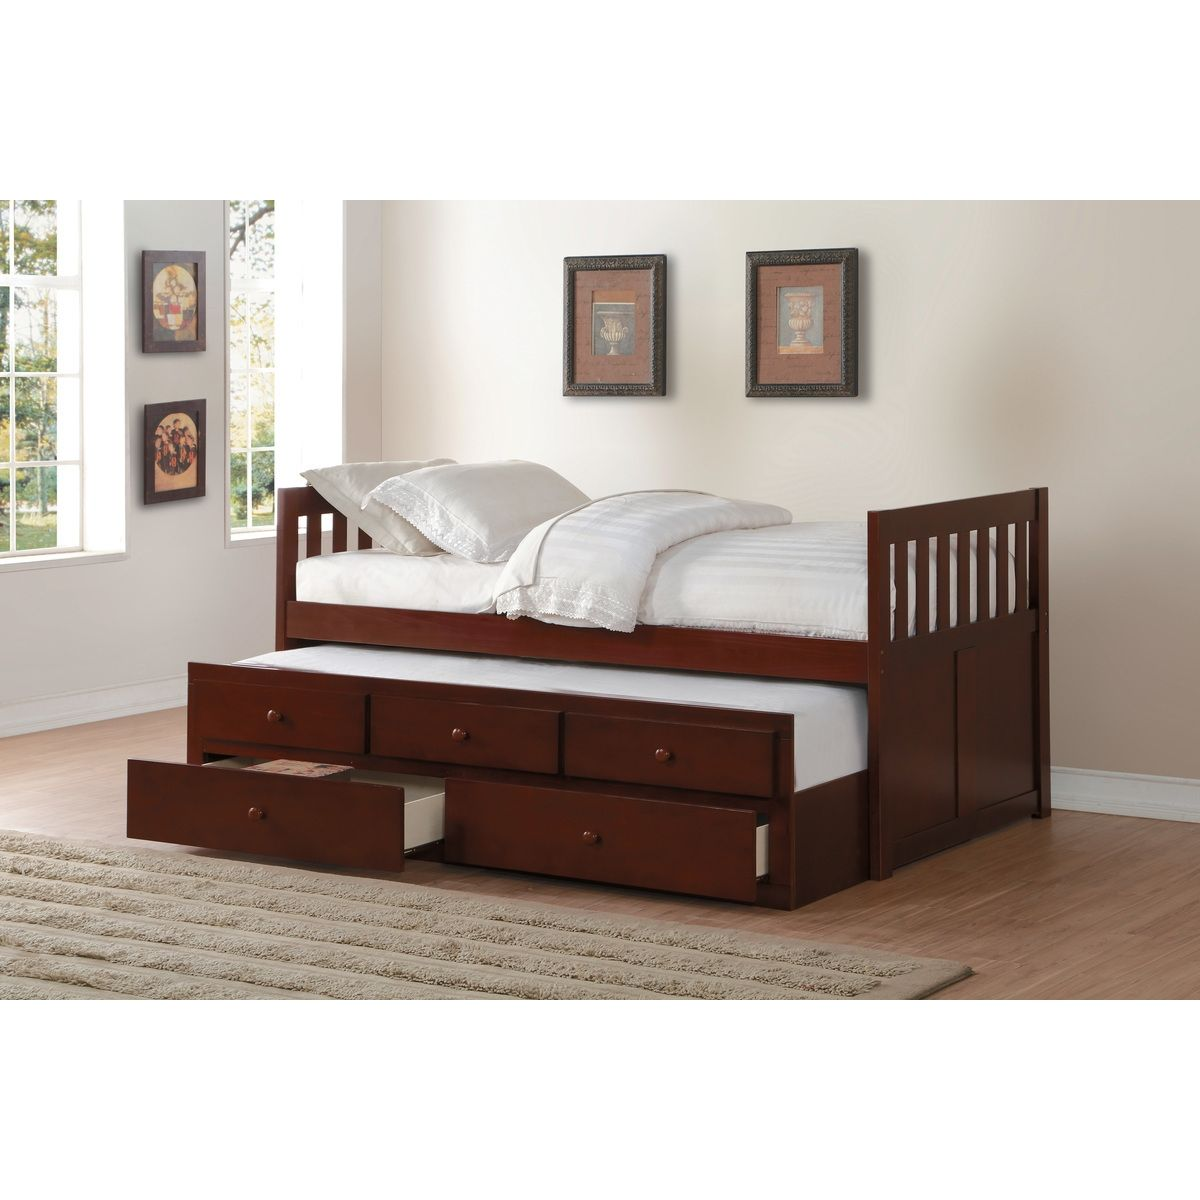 Homelegance Rowe Wood Trundle Bed w/Storage Drawers, Twin